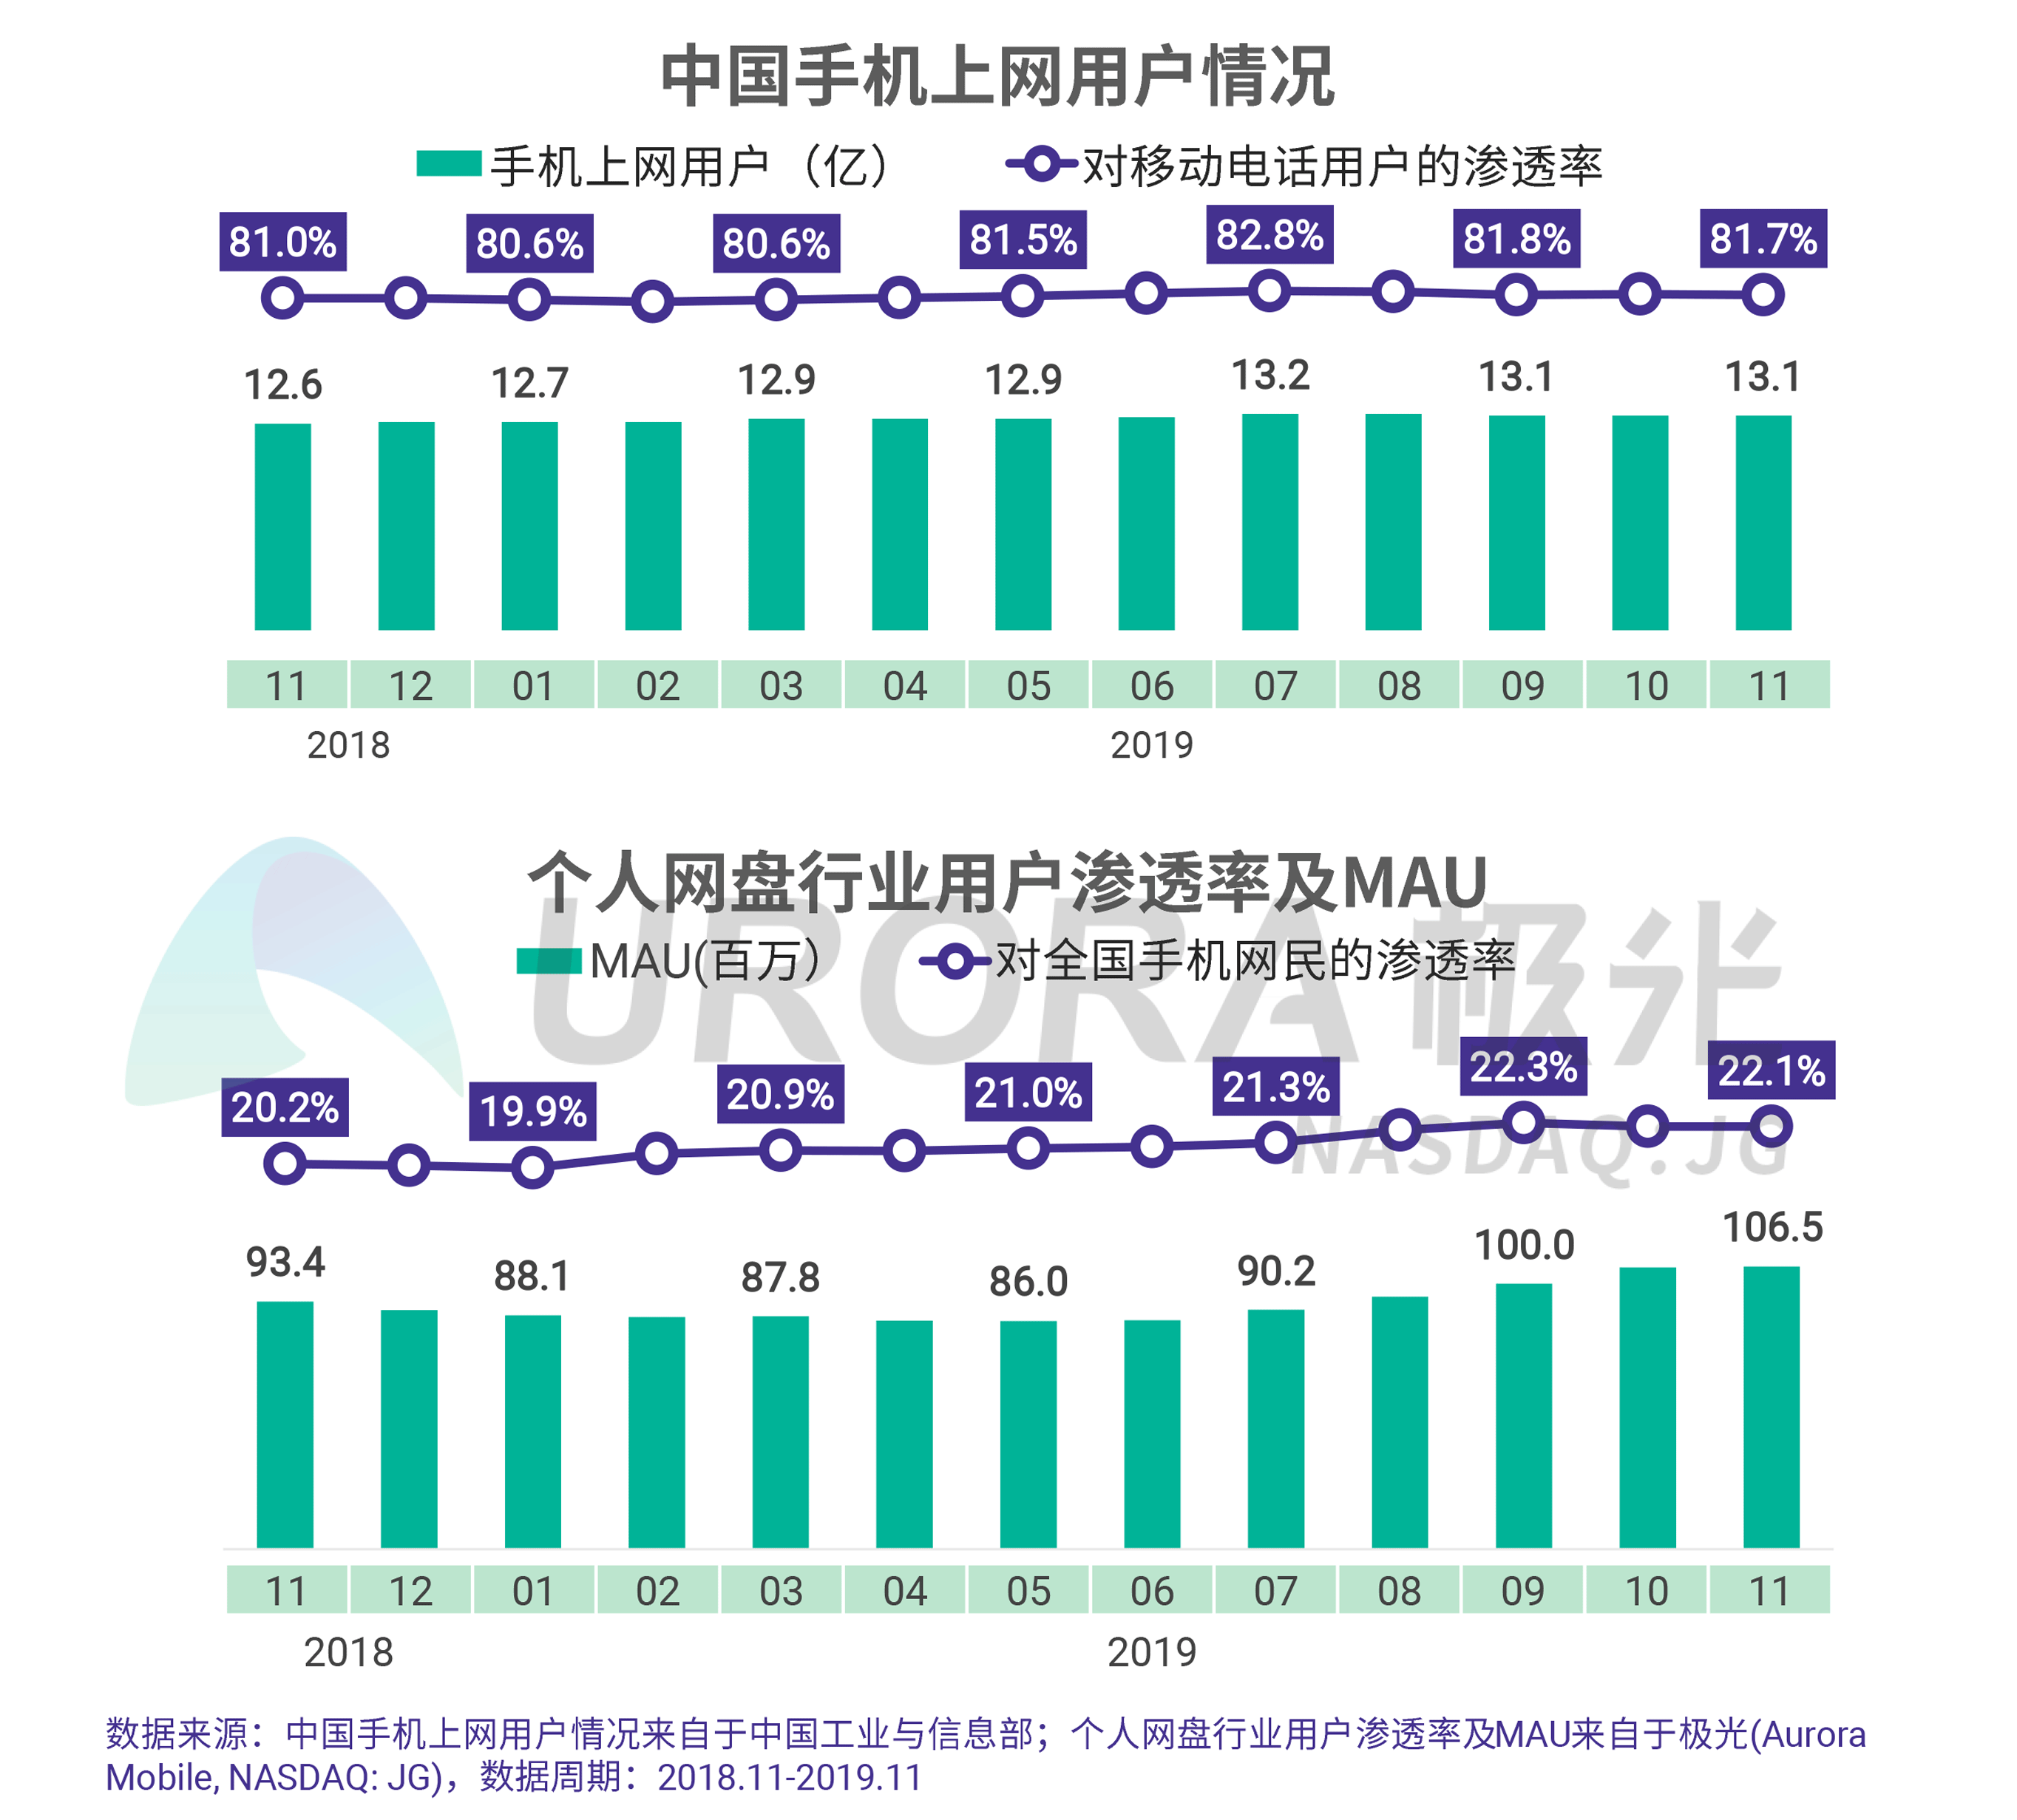 JIGUANG-个人网盘行业研究报告-final---切图版2-8.png